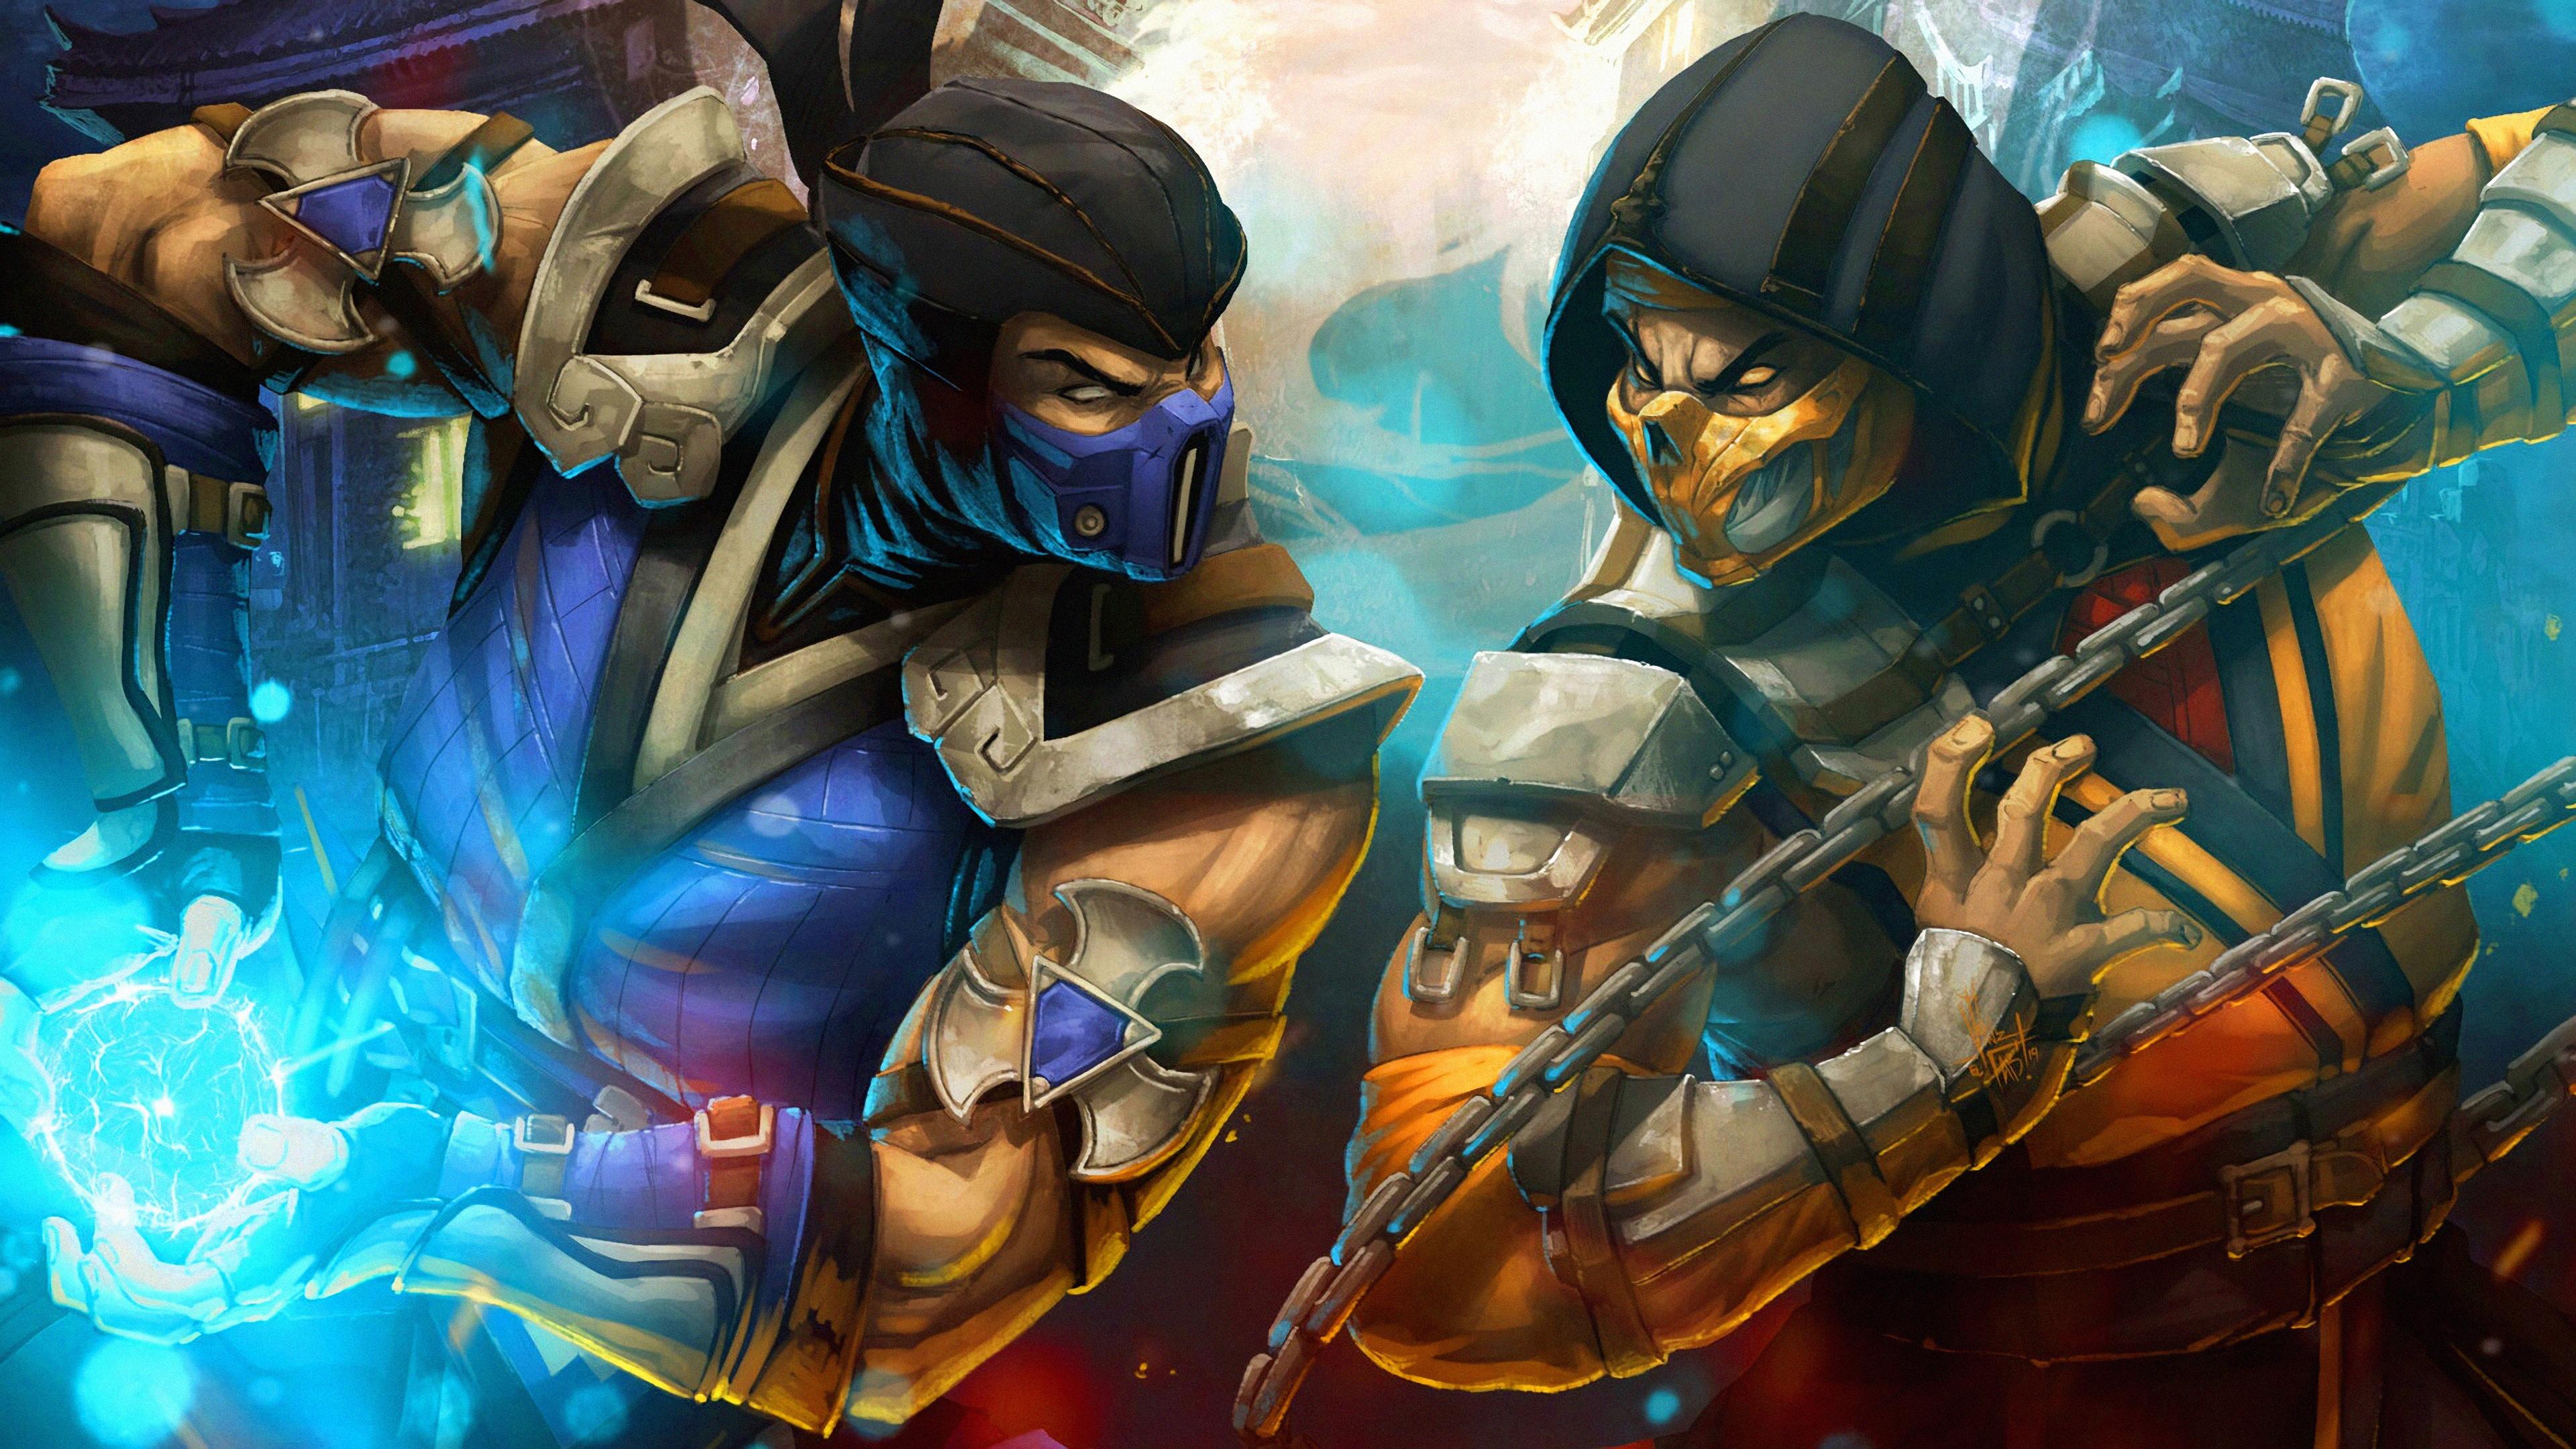 Mortal Kombat 11 4k Ultra Hd Wallpaper Background Image